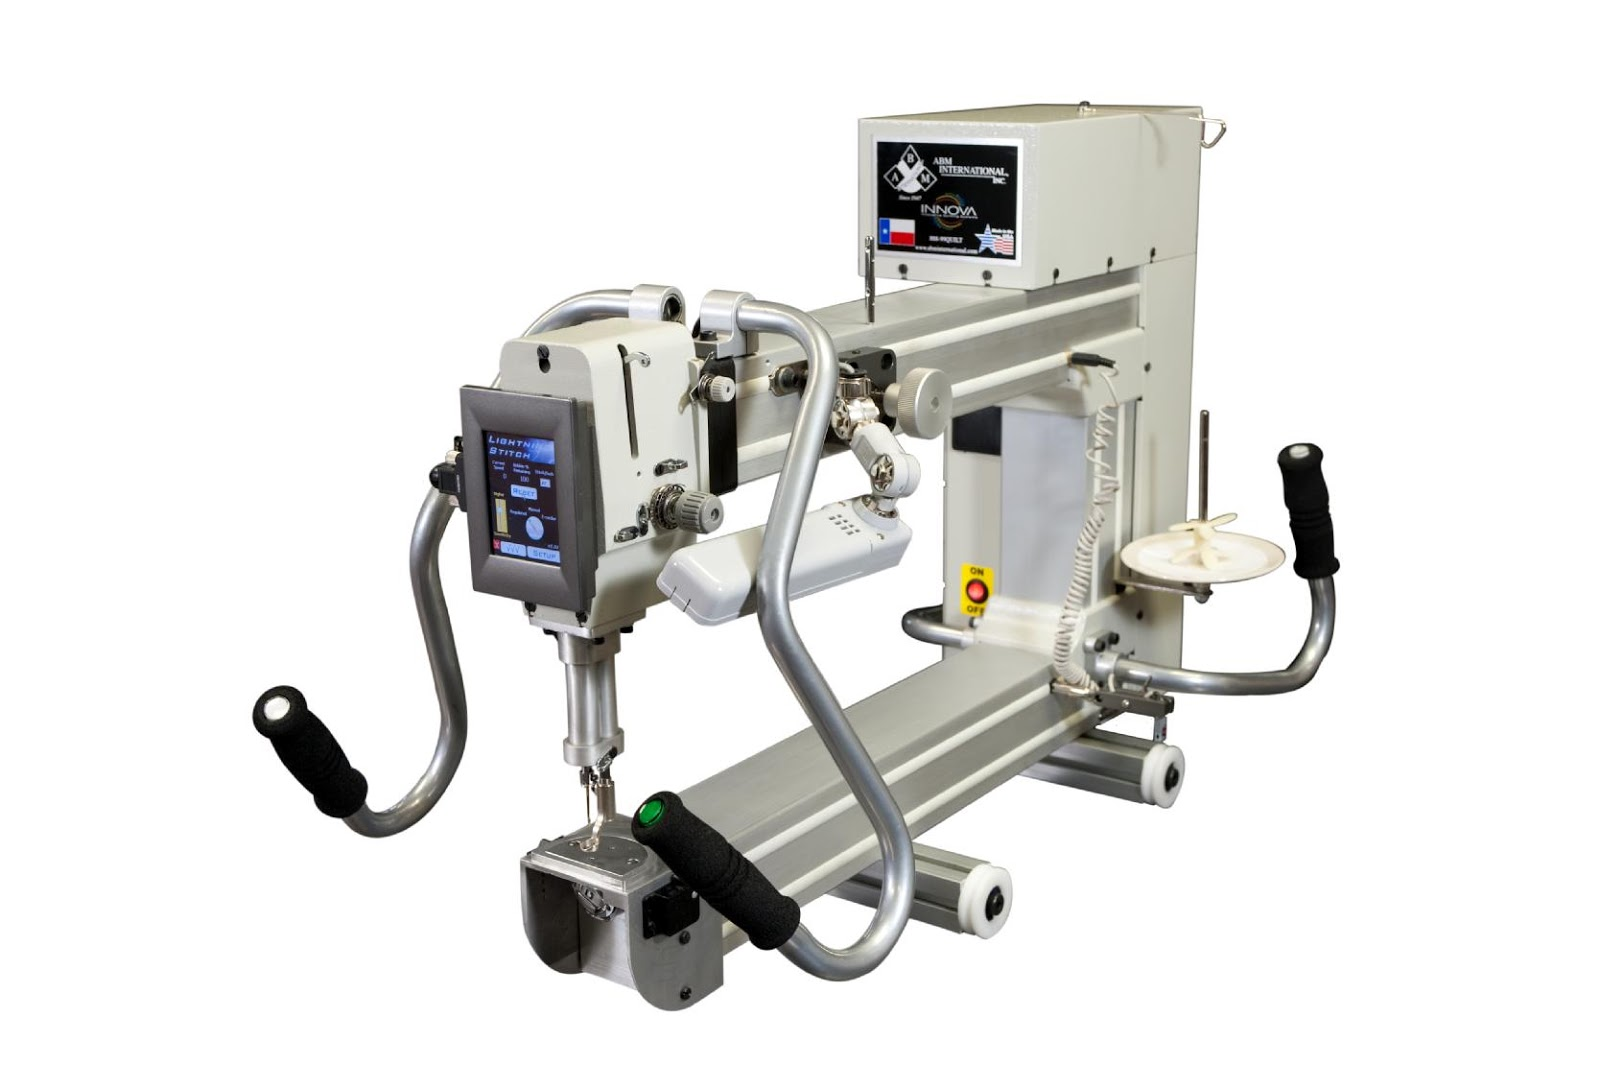 innova quilting machine used